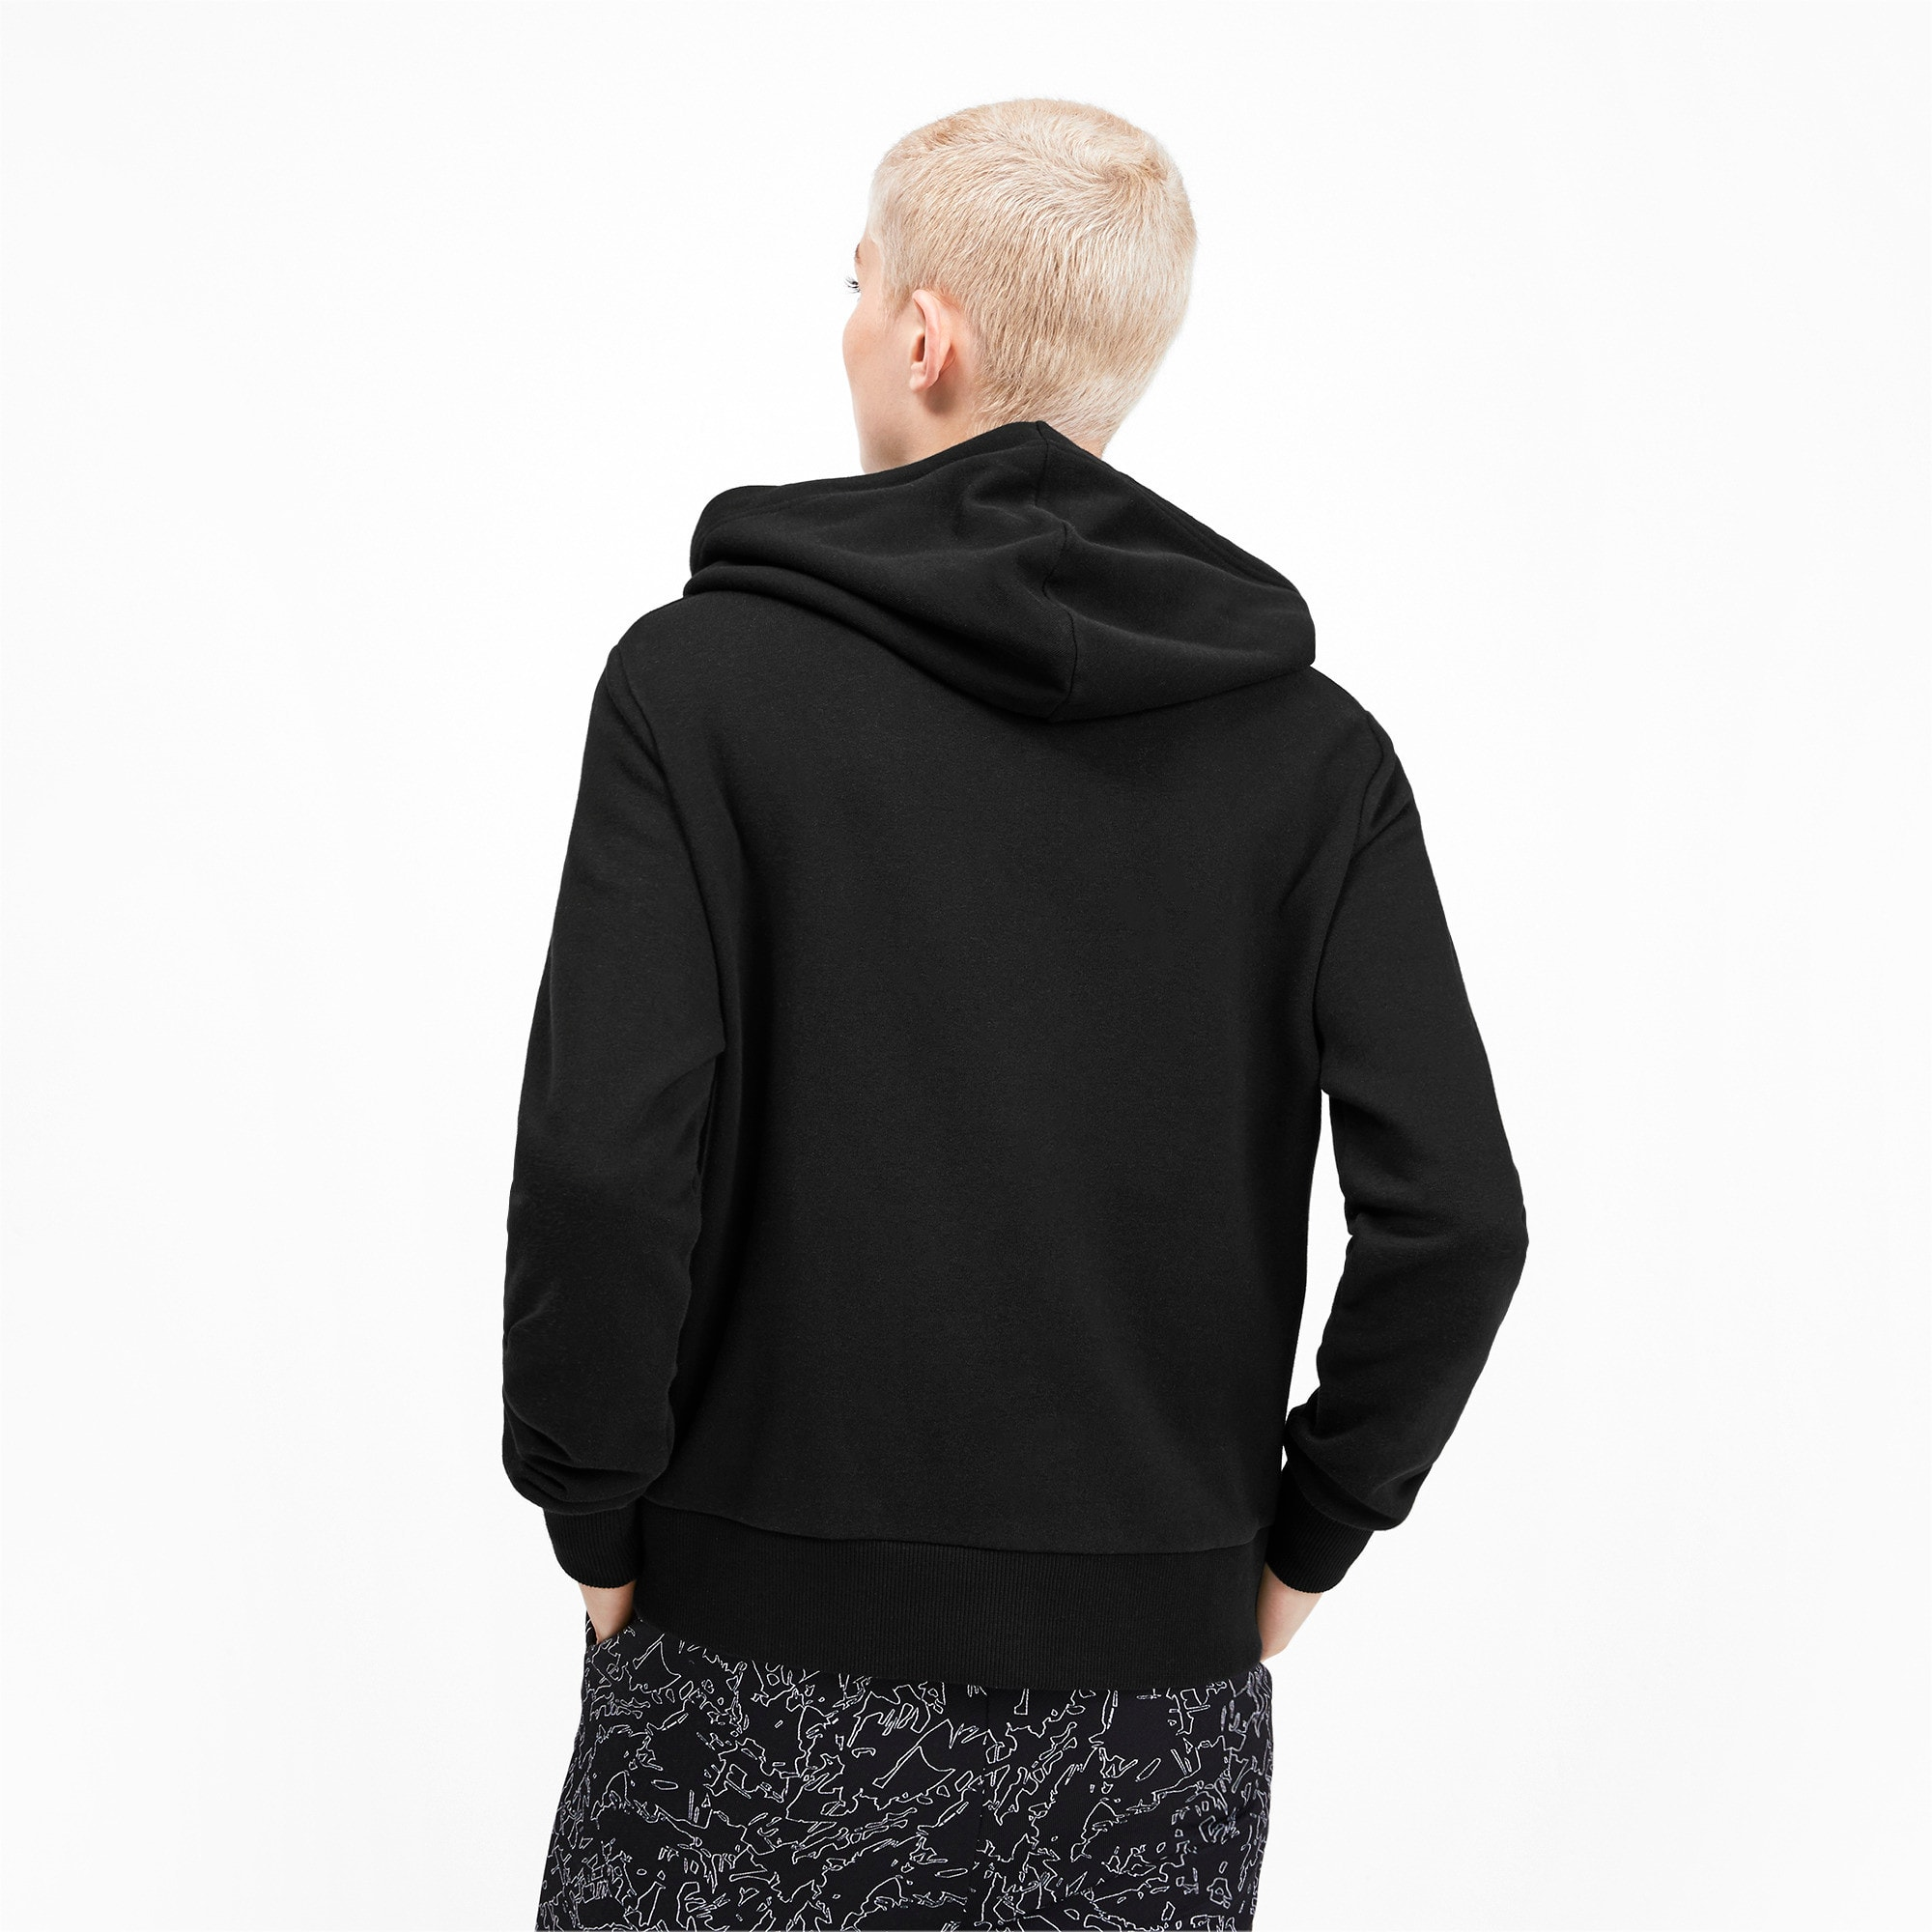 Thumbnail 3 of Classics Logo hoodie voor dames, Puma Black, medium